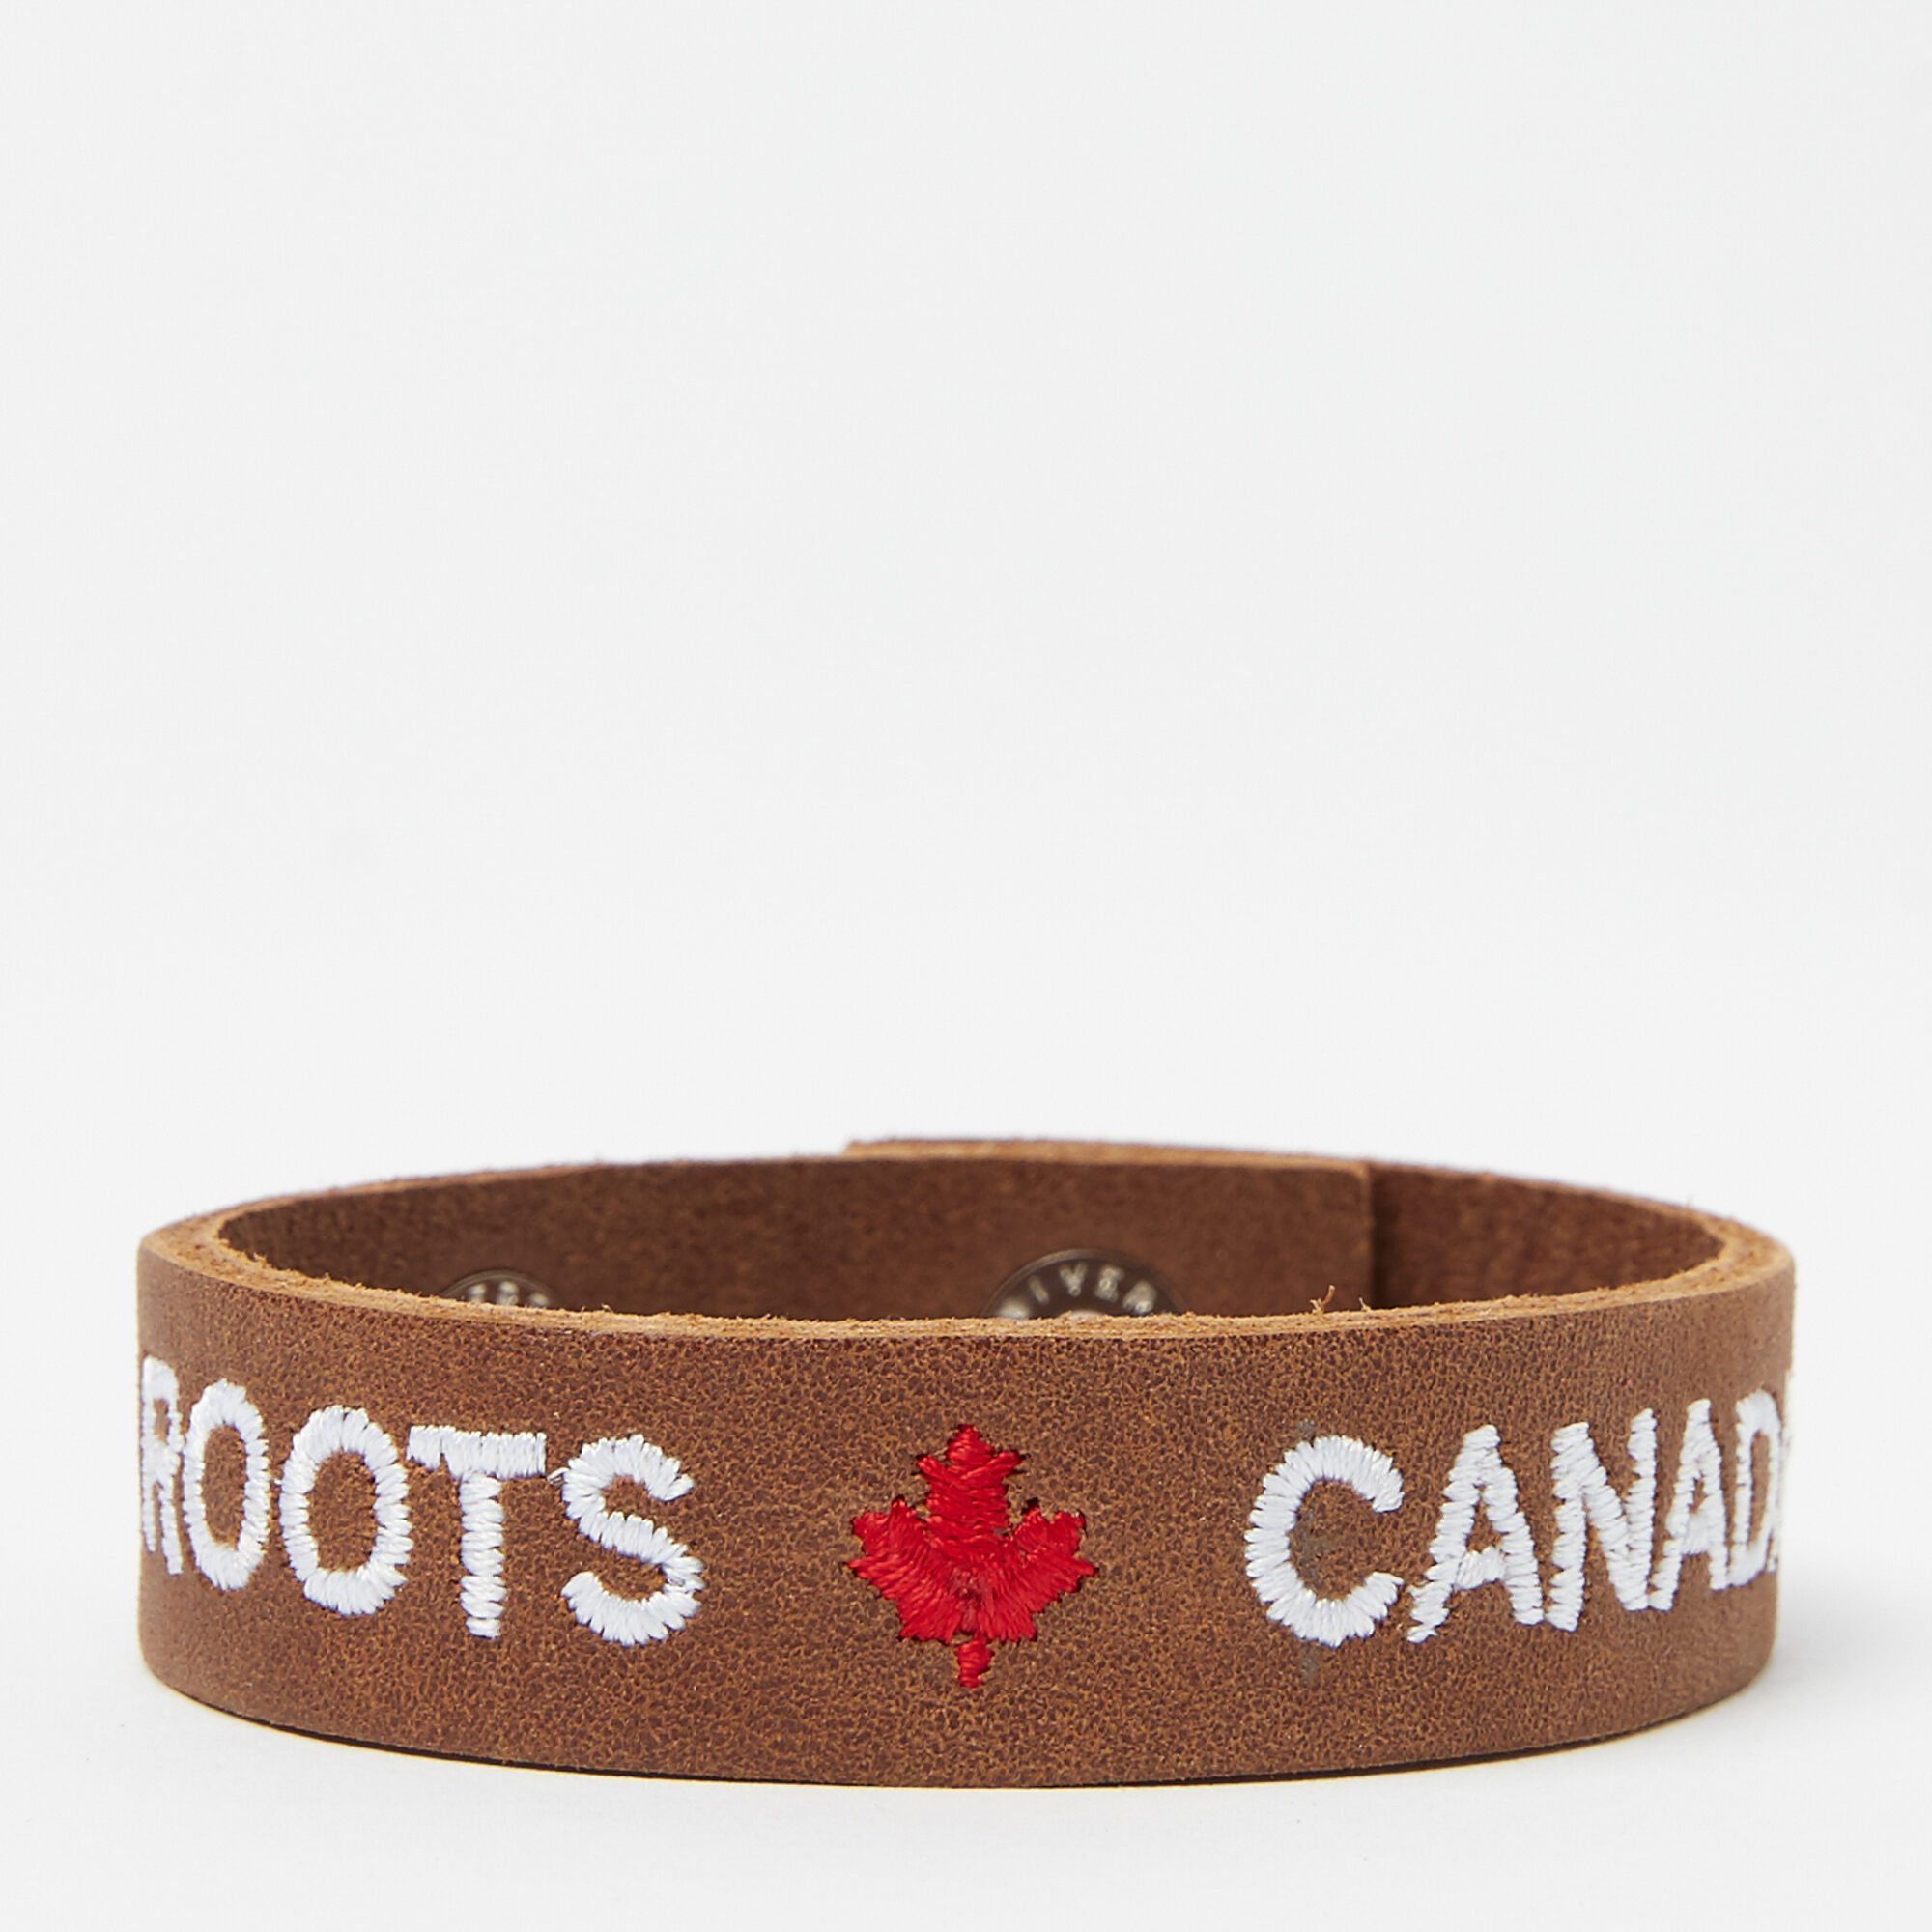 Roots Canada 150 Bracelet